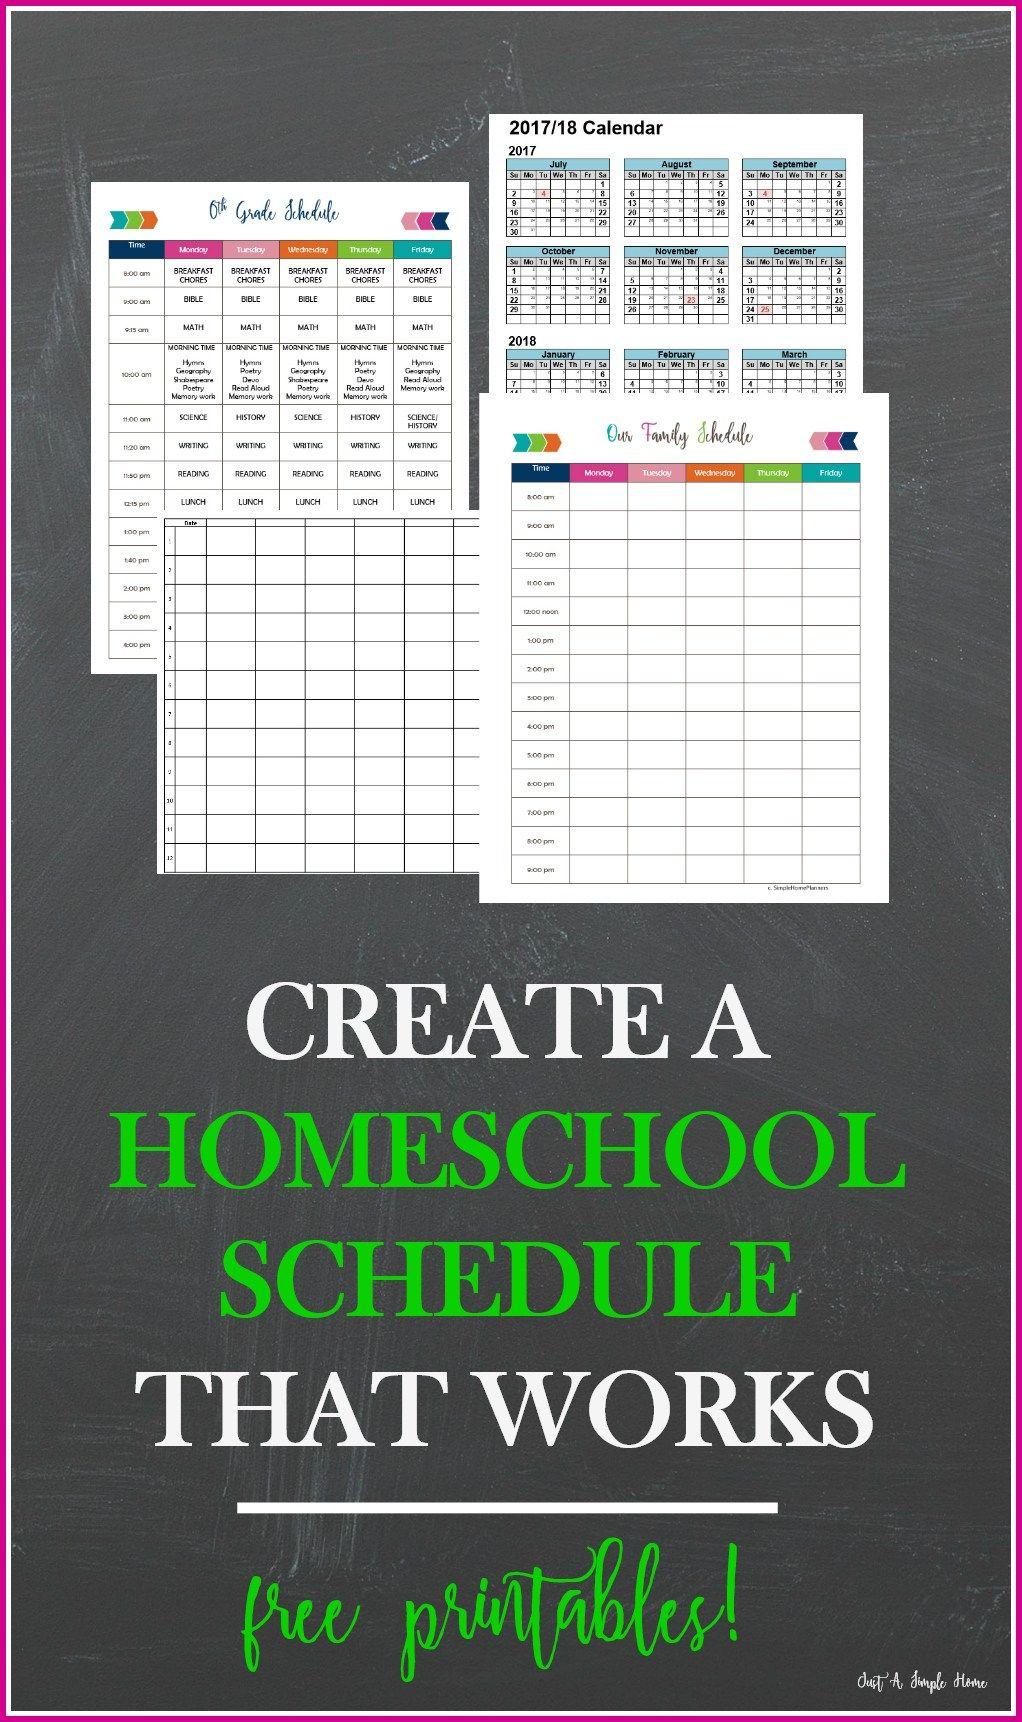 create a homeschool schedule that works homeschooling pinterest